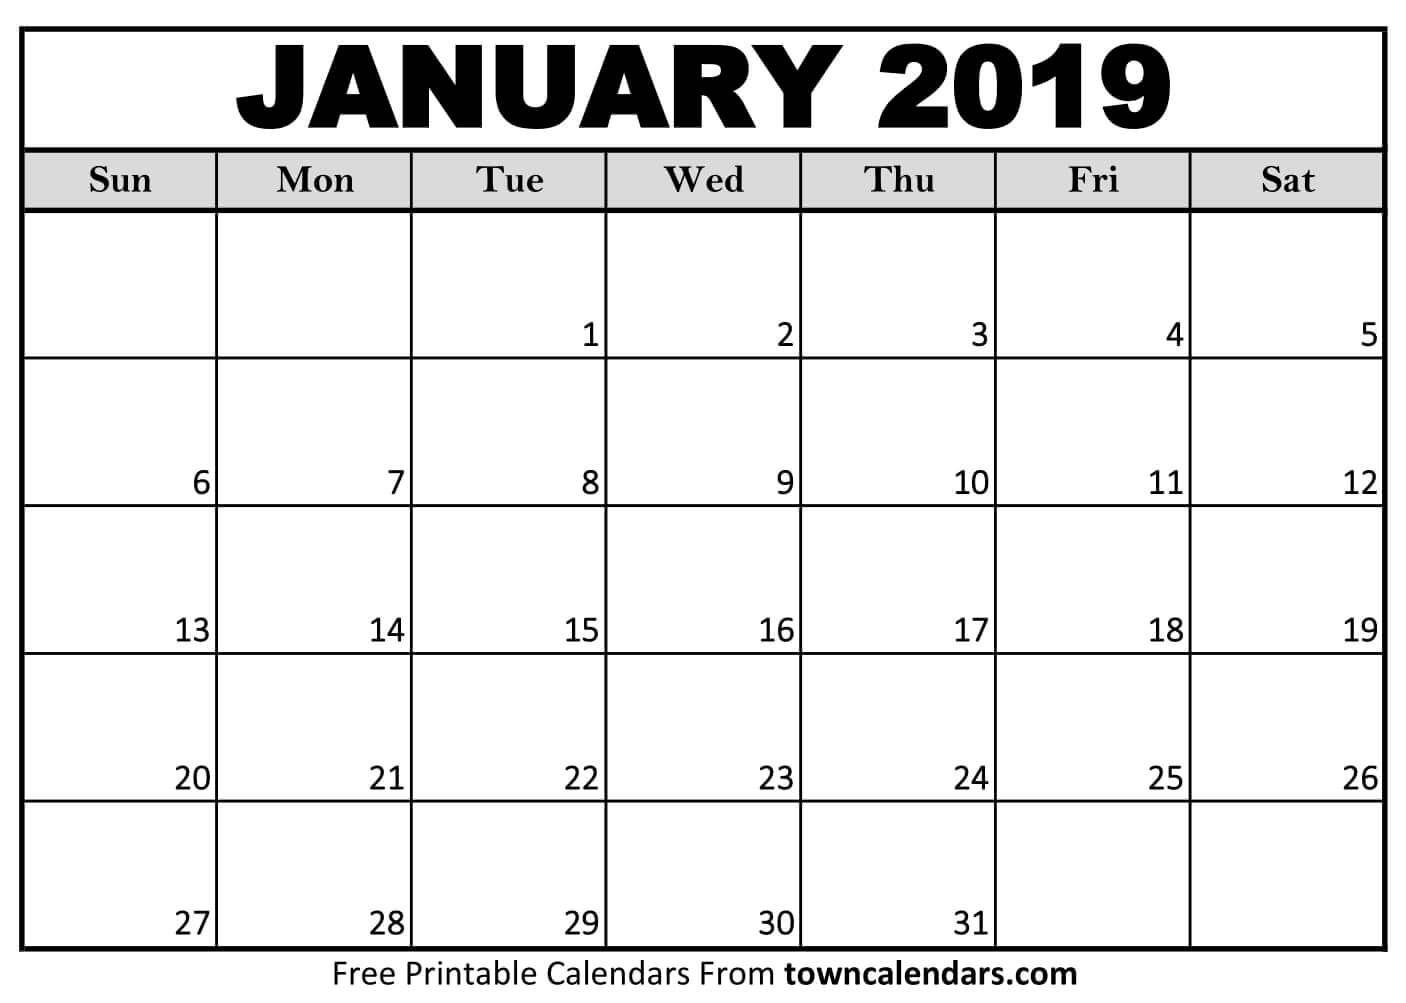 2019 January Calendar Printable Monthly Template Calendar